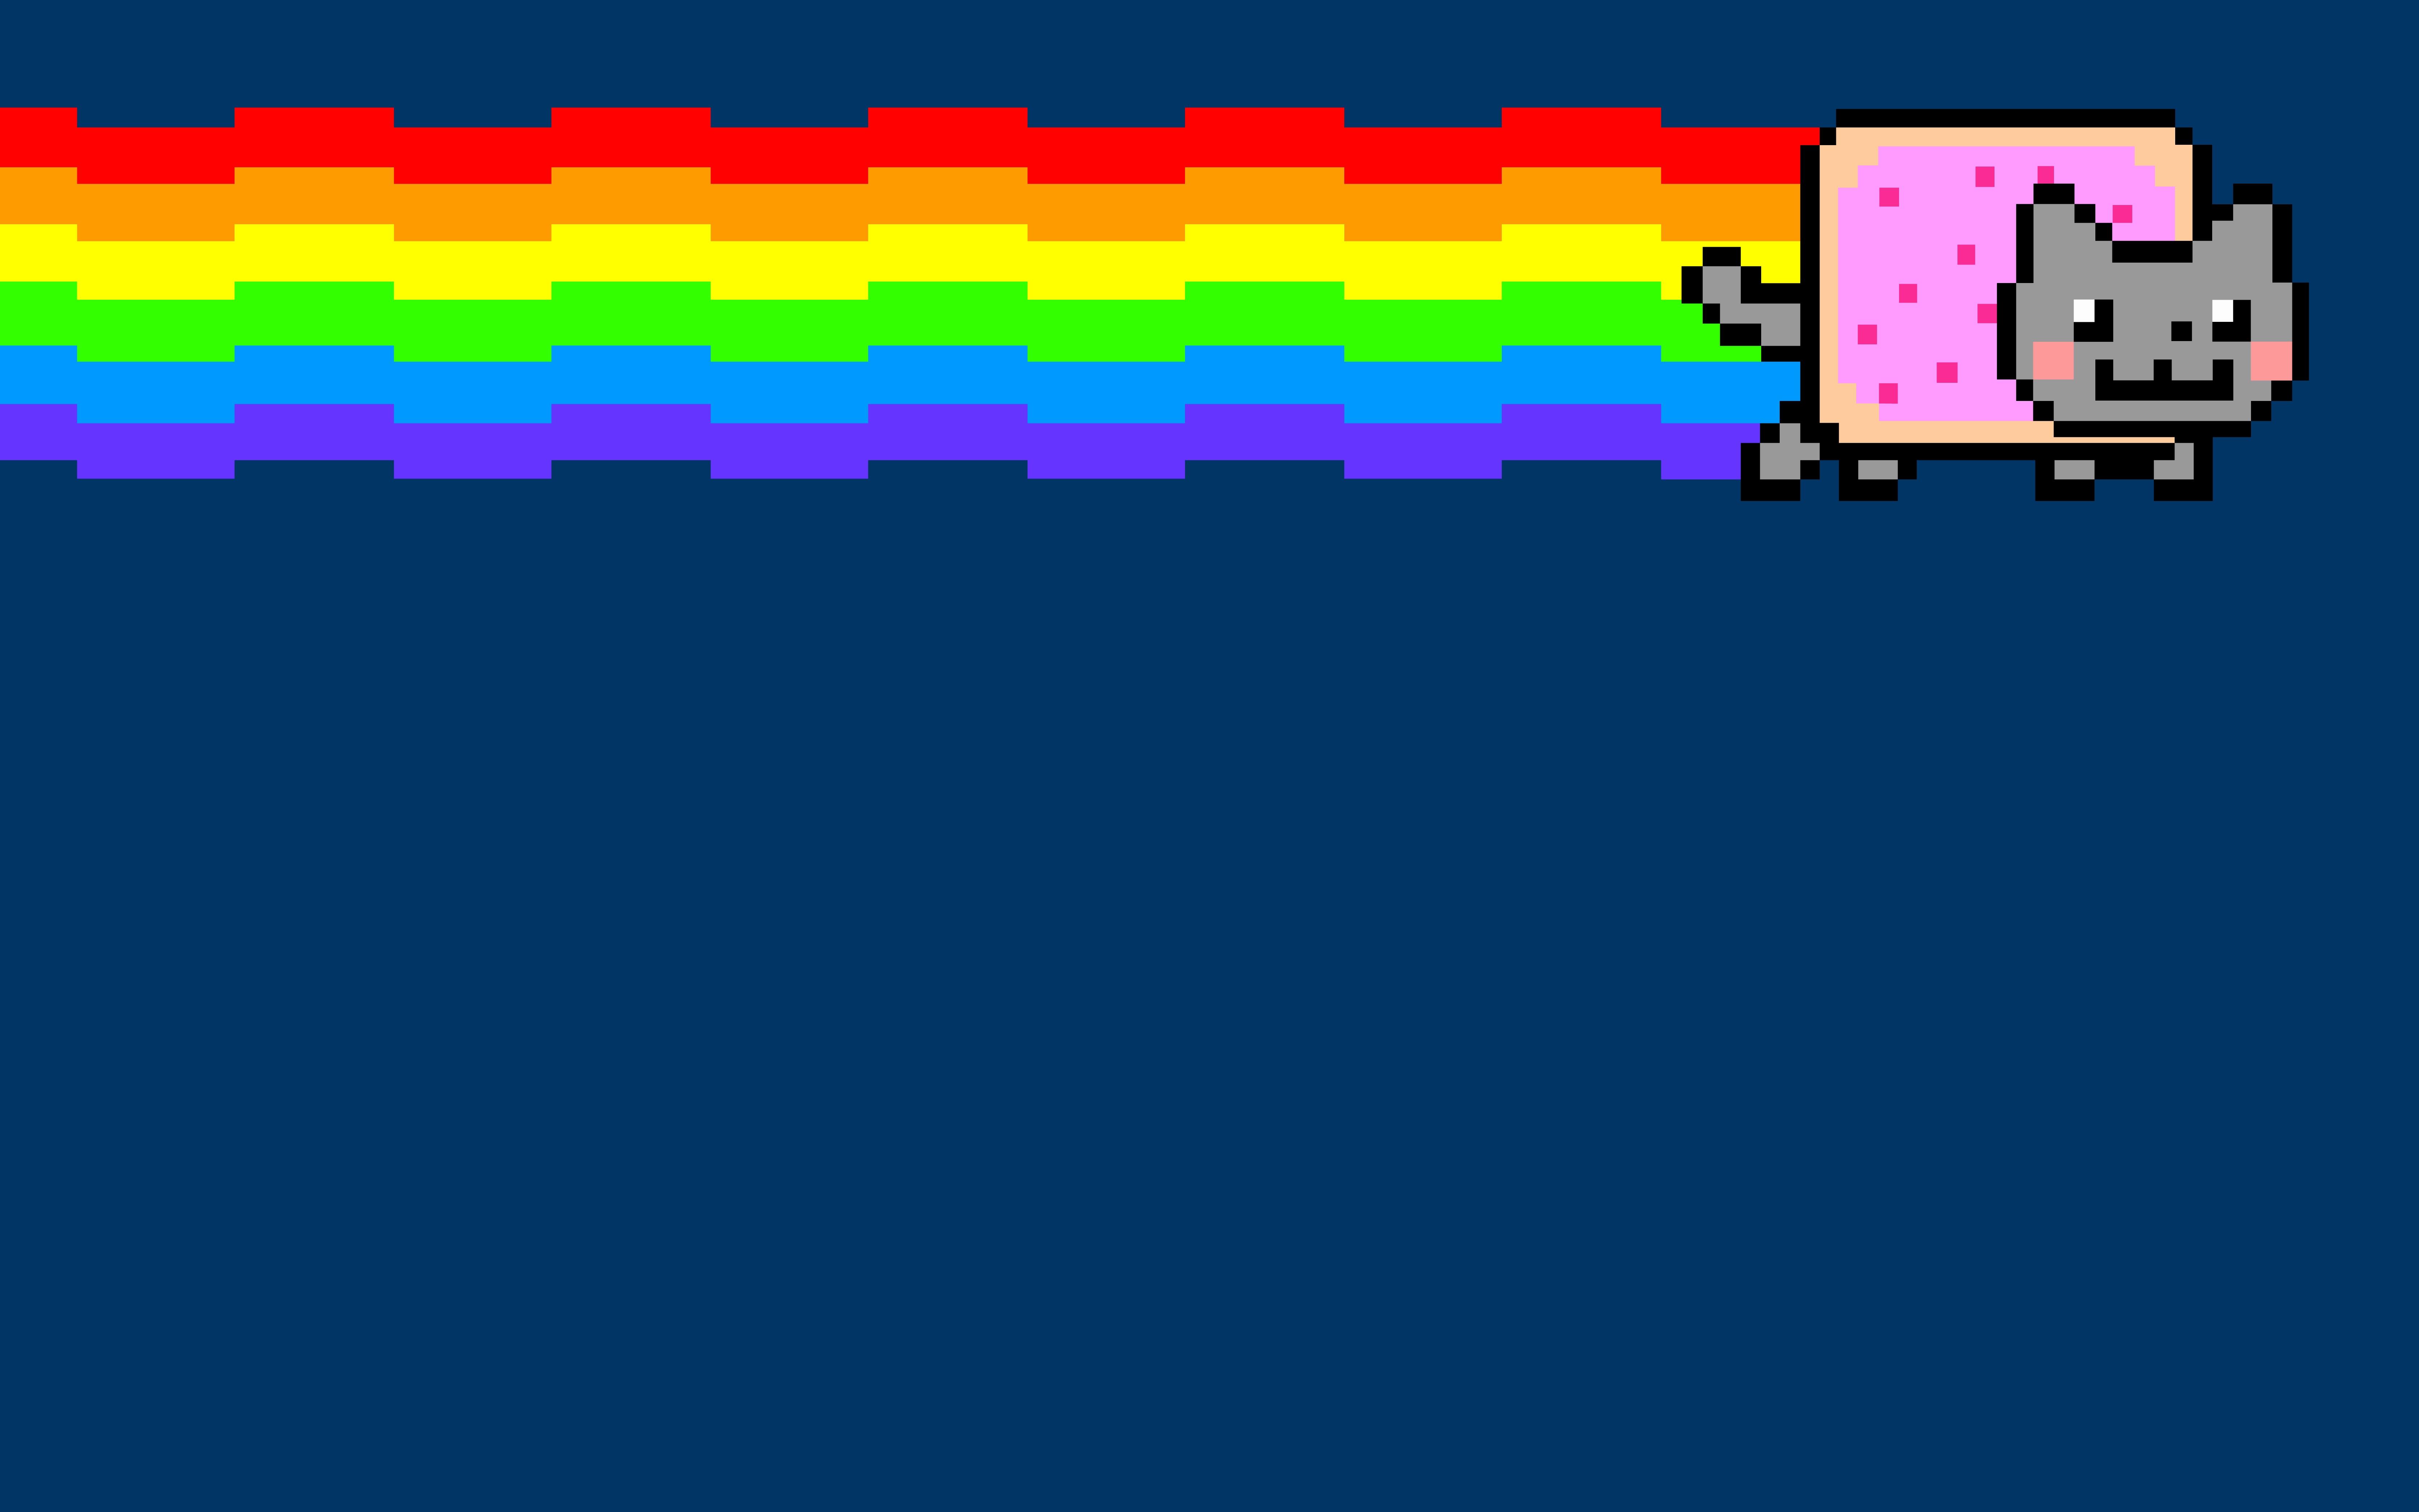 Nyan Cat Site Osu Ppy Sh